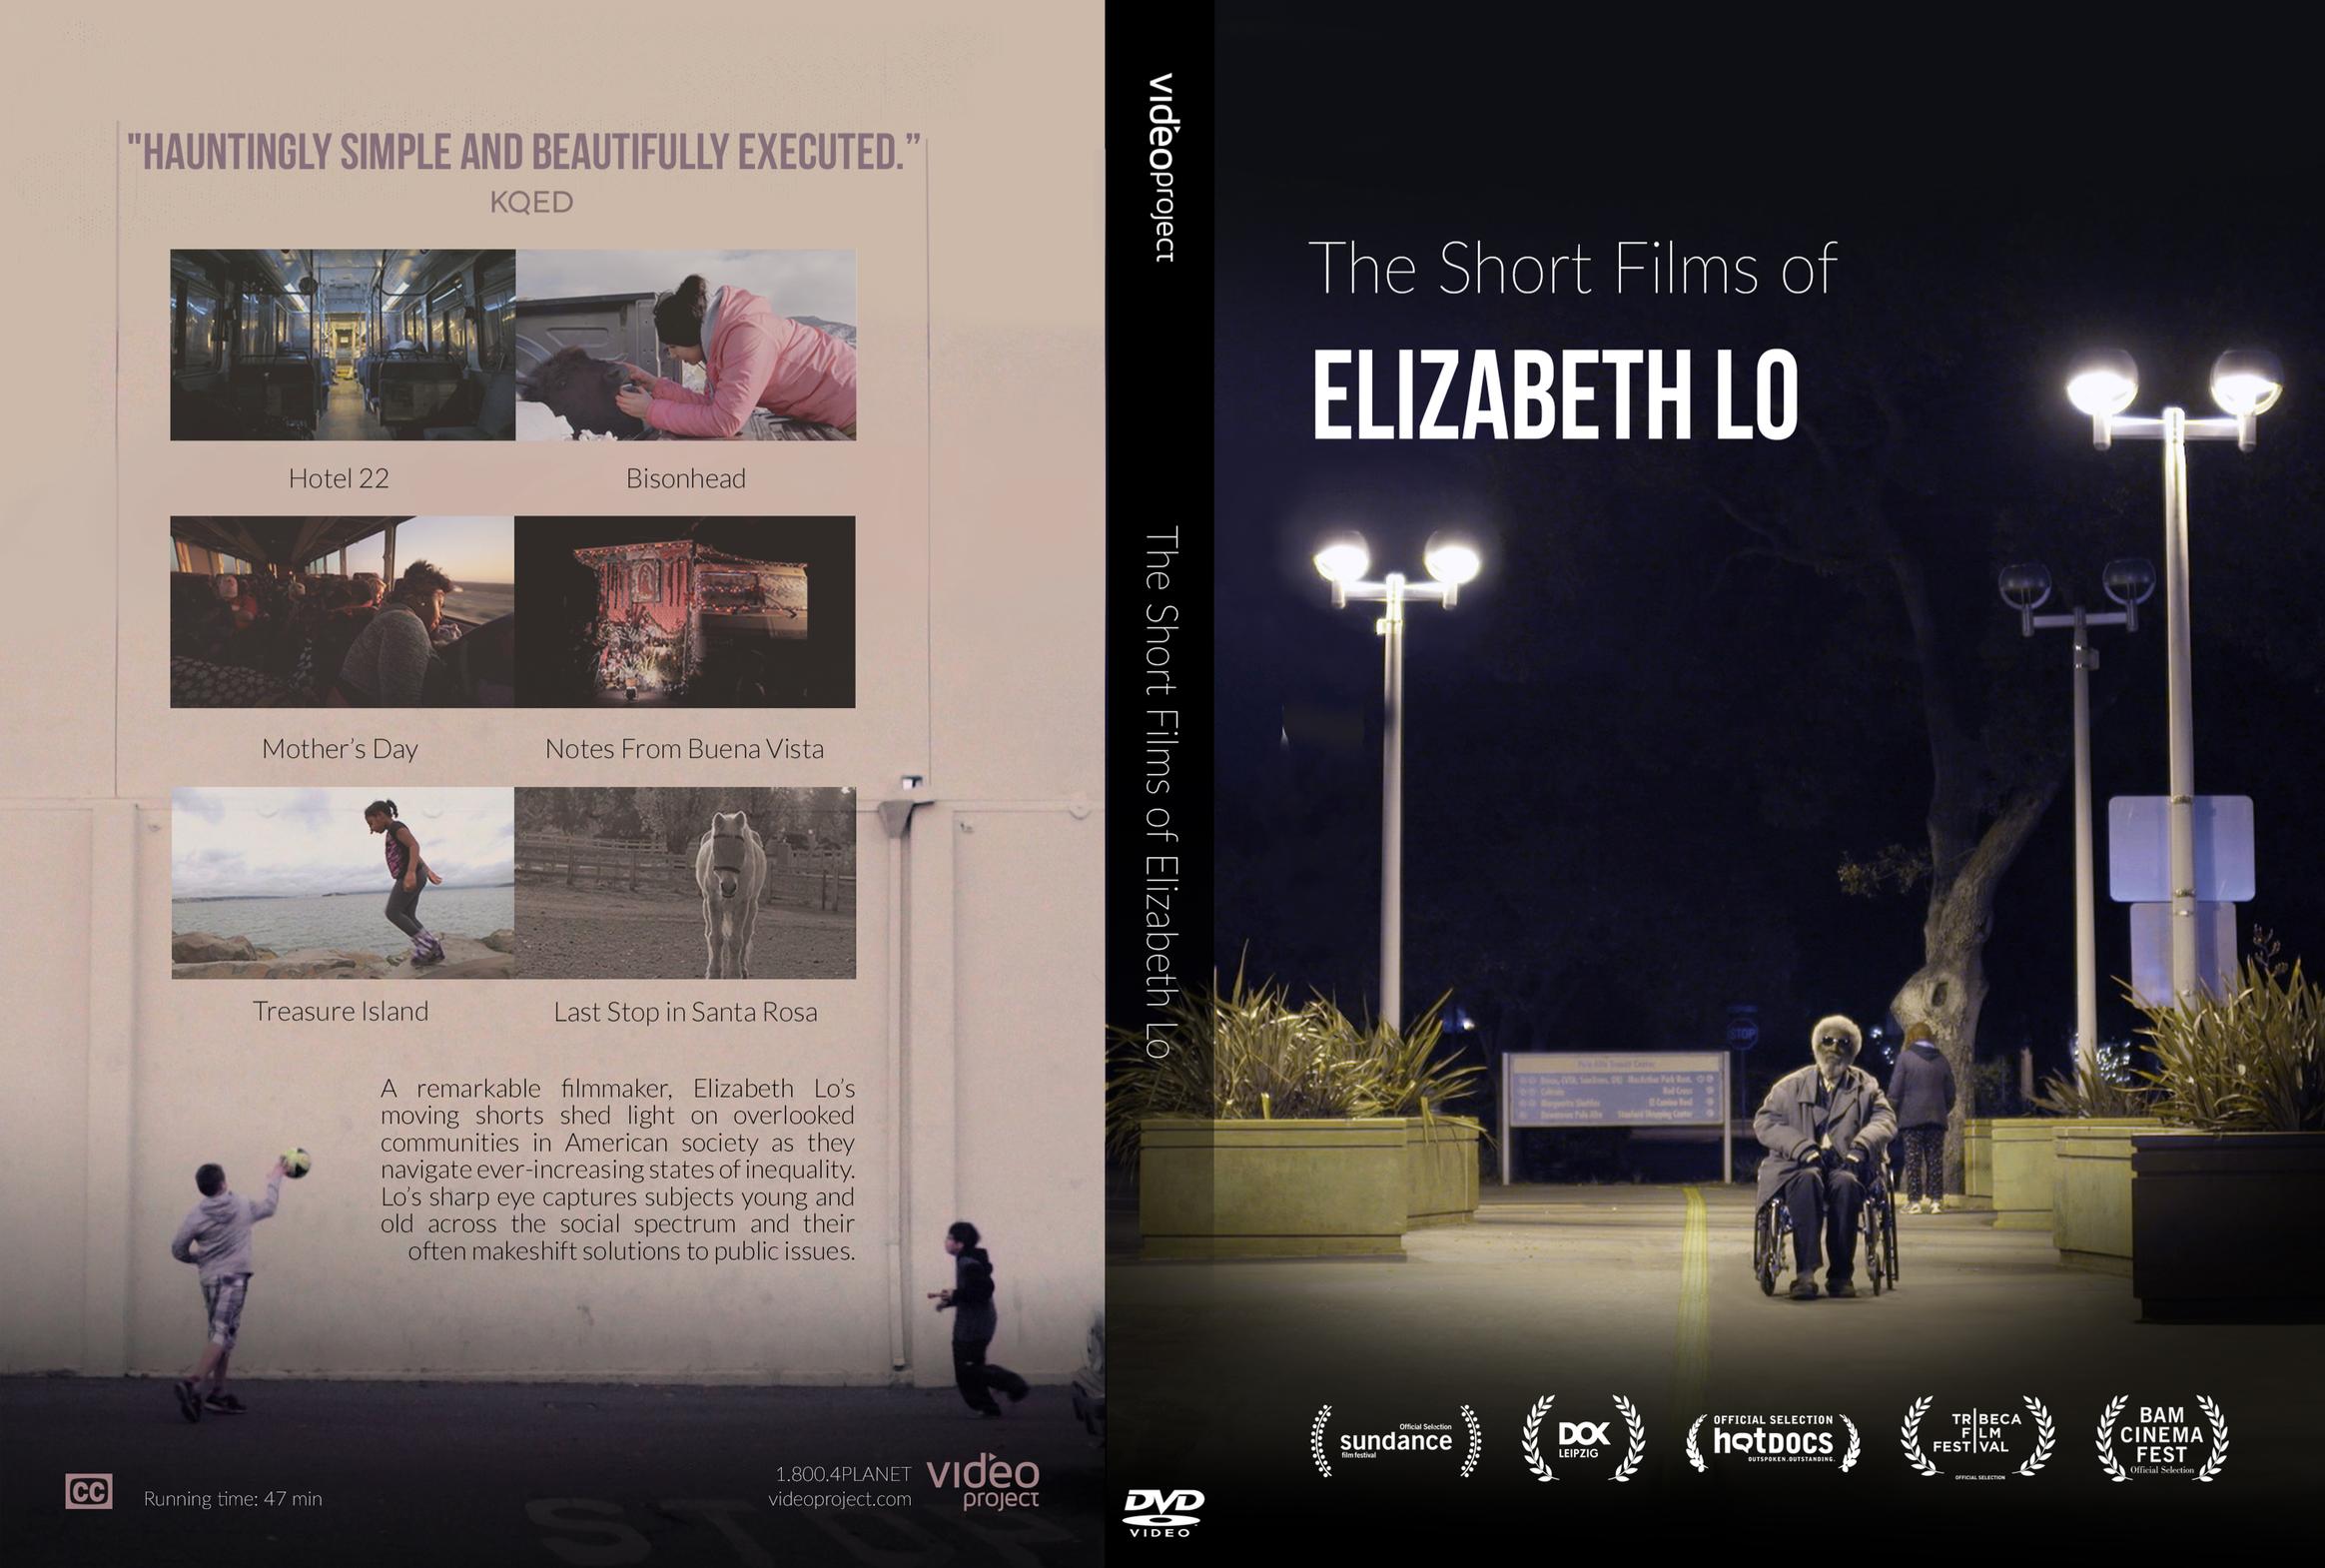 The Short Films of Elizabeth Lo